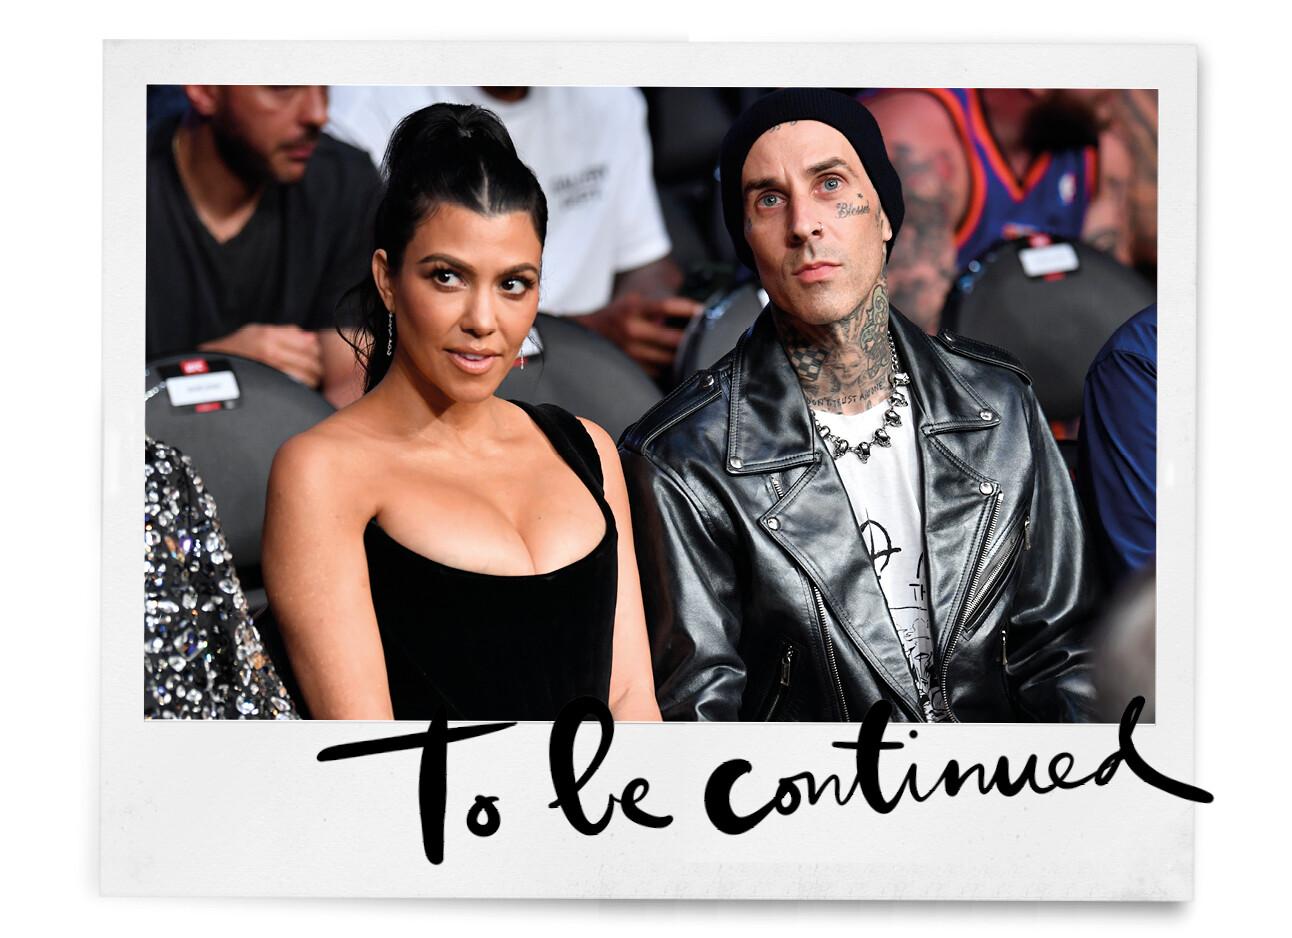 Overzichtje: wat is er nou allemaal aan de hand rondom Kourtney Kardashian?